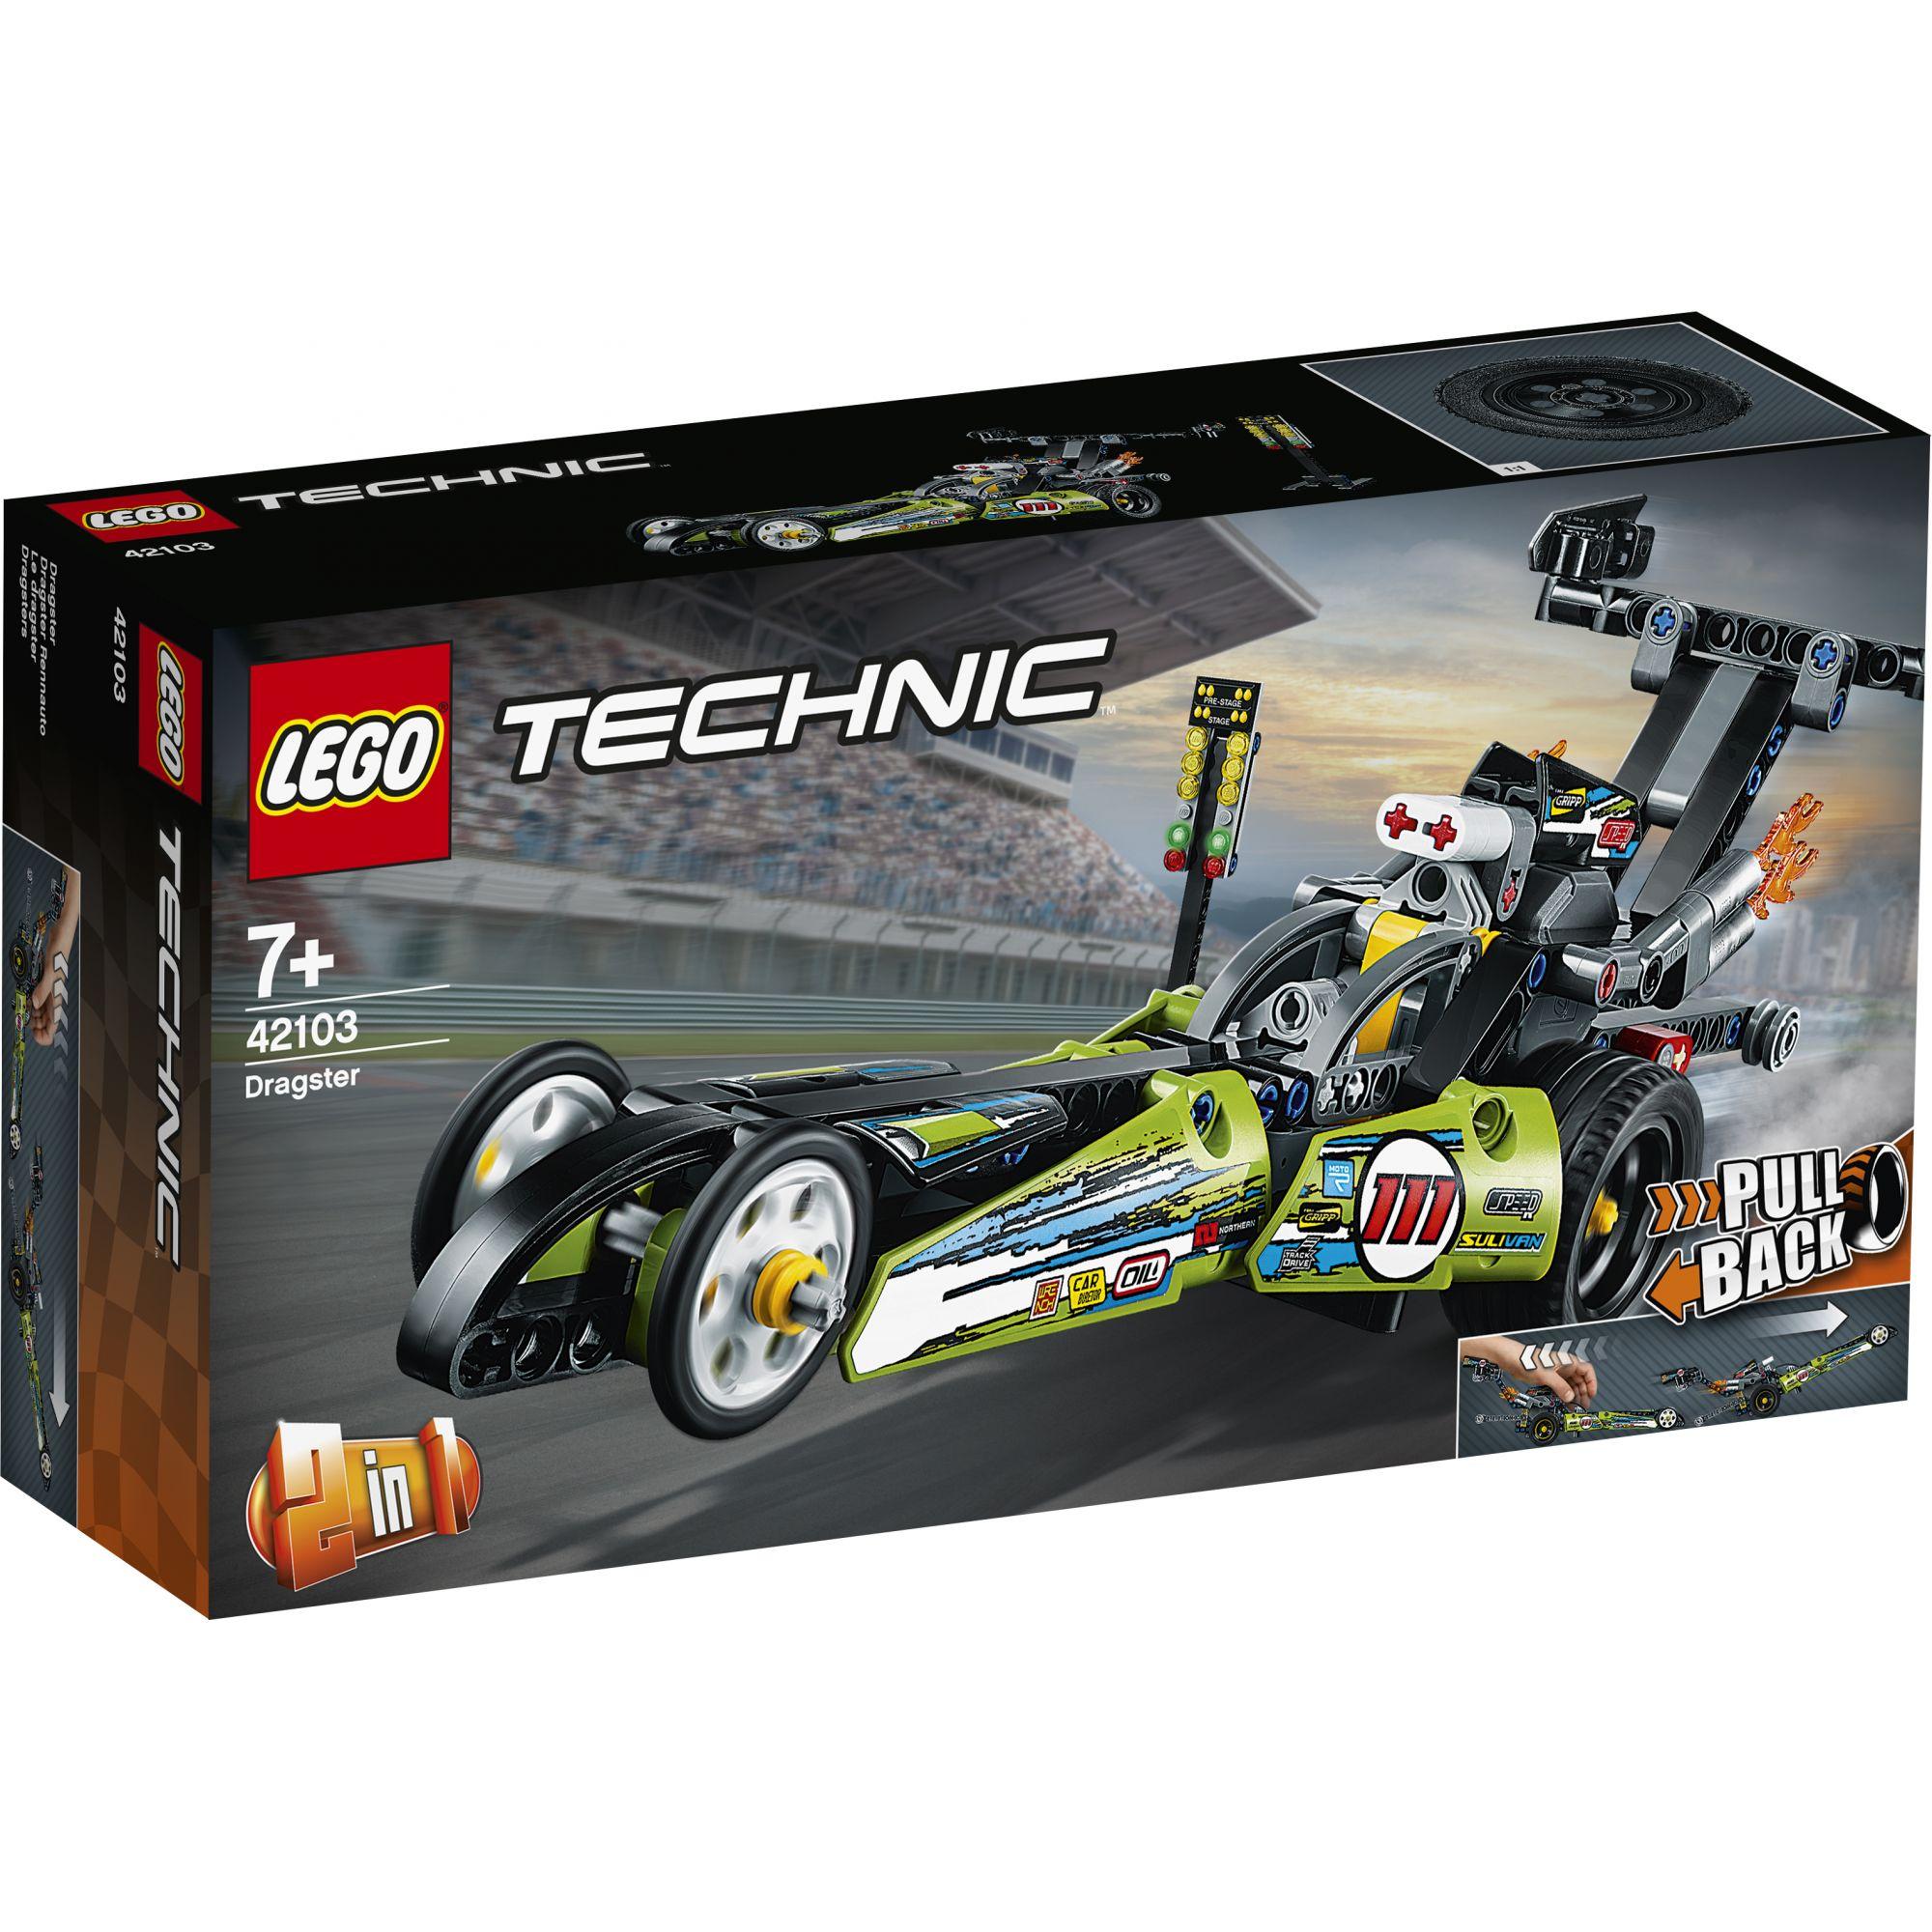 LEGO TECHNIC -  Dragster - 42103 LEGO TECHNIC